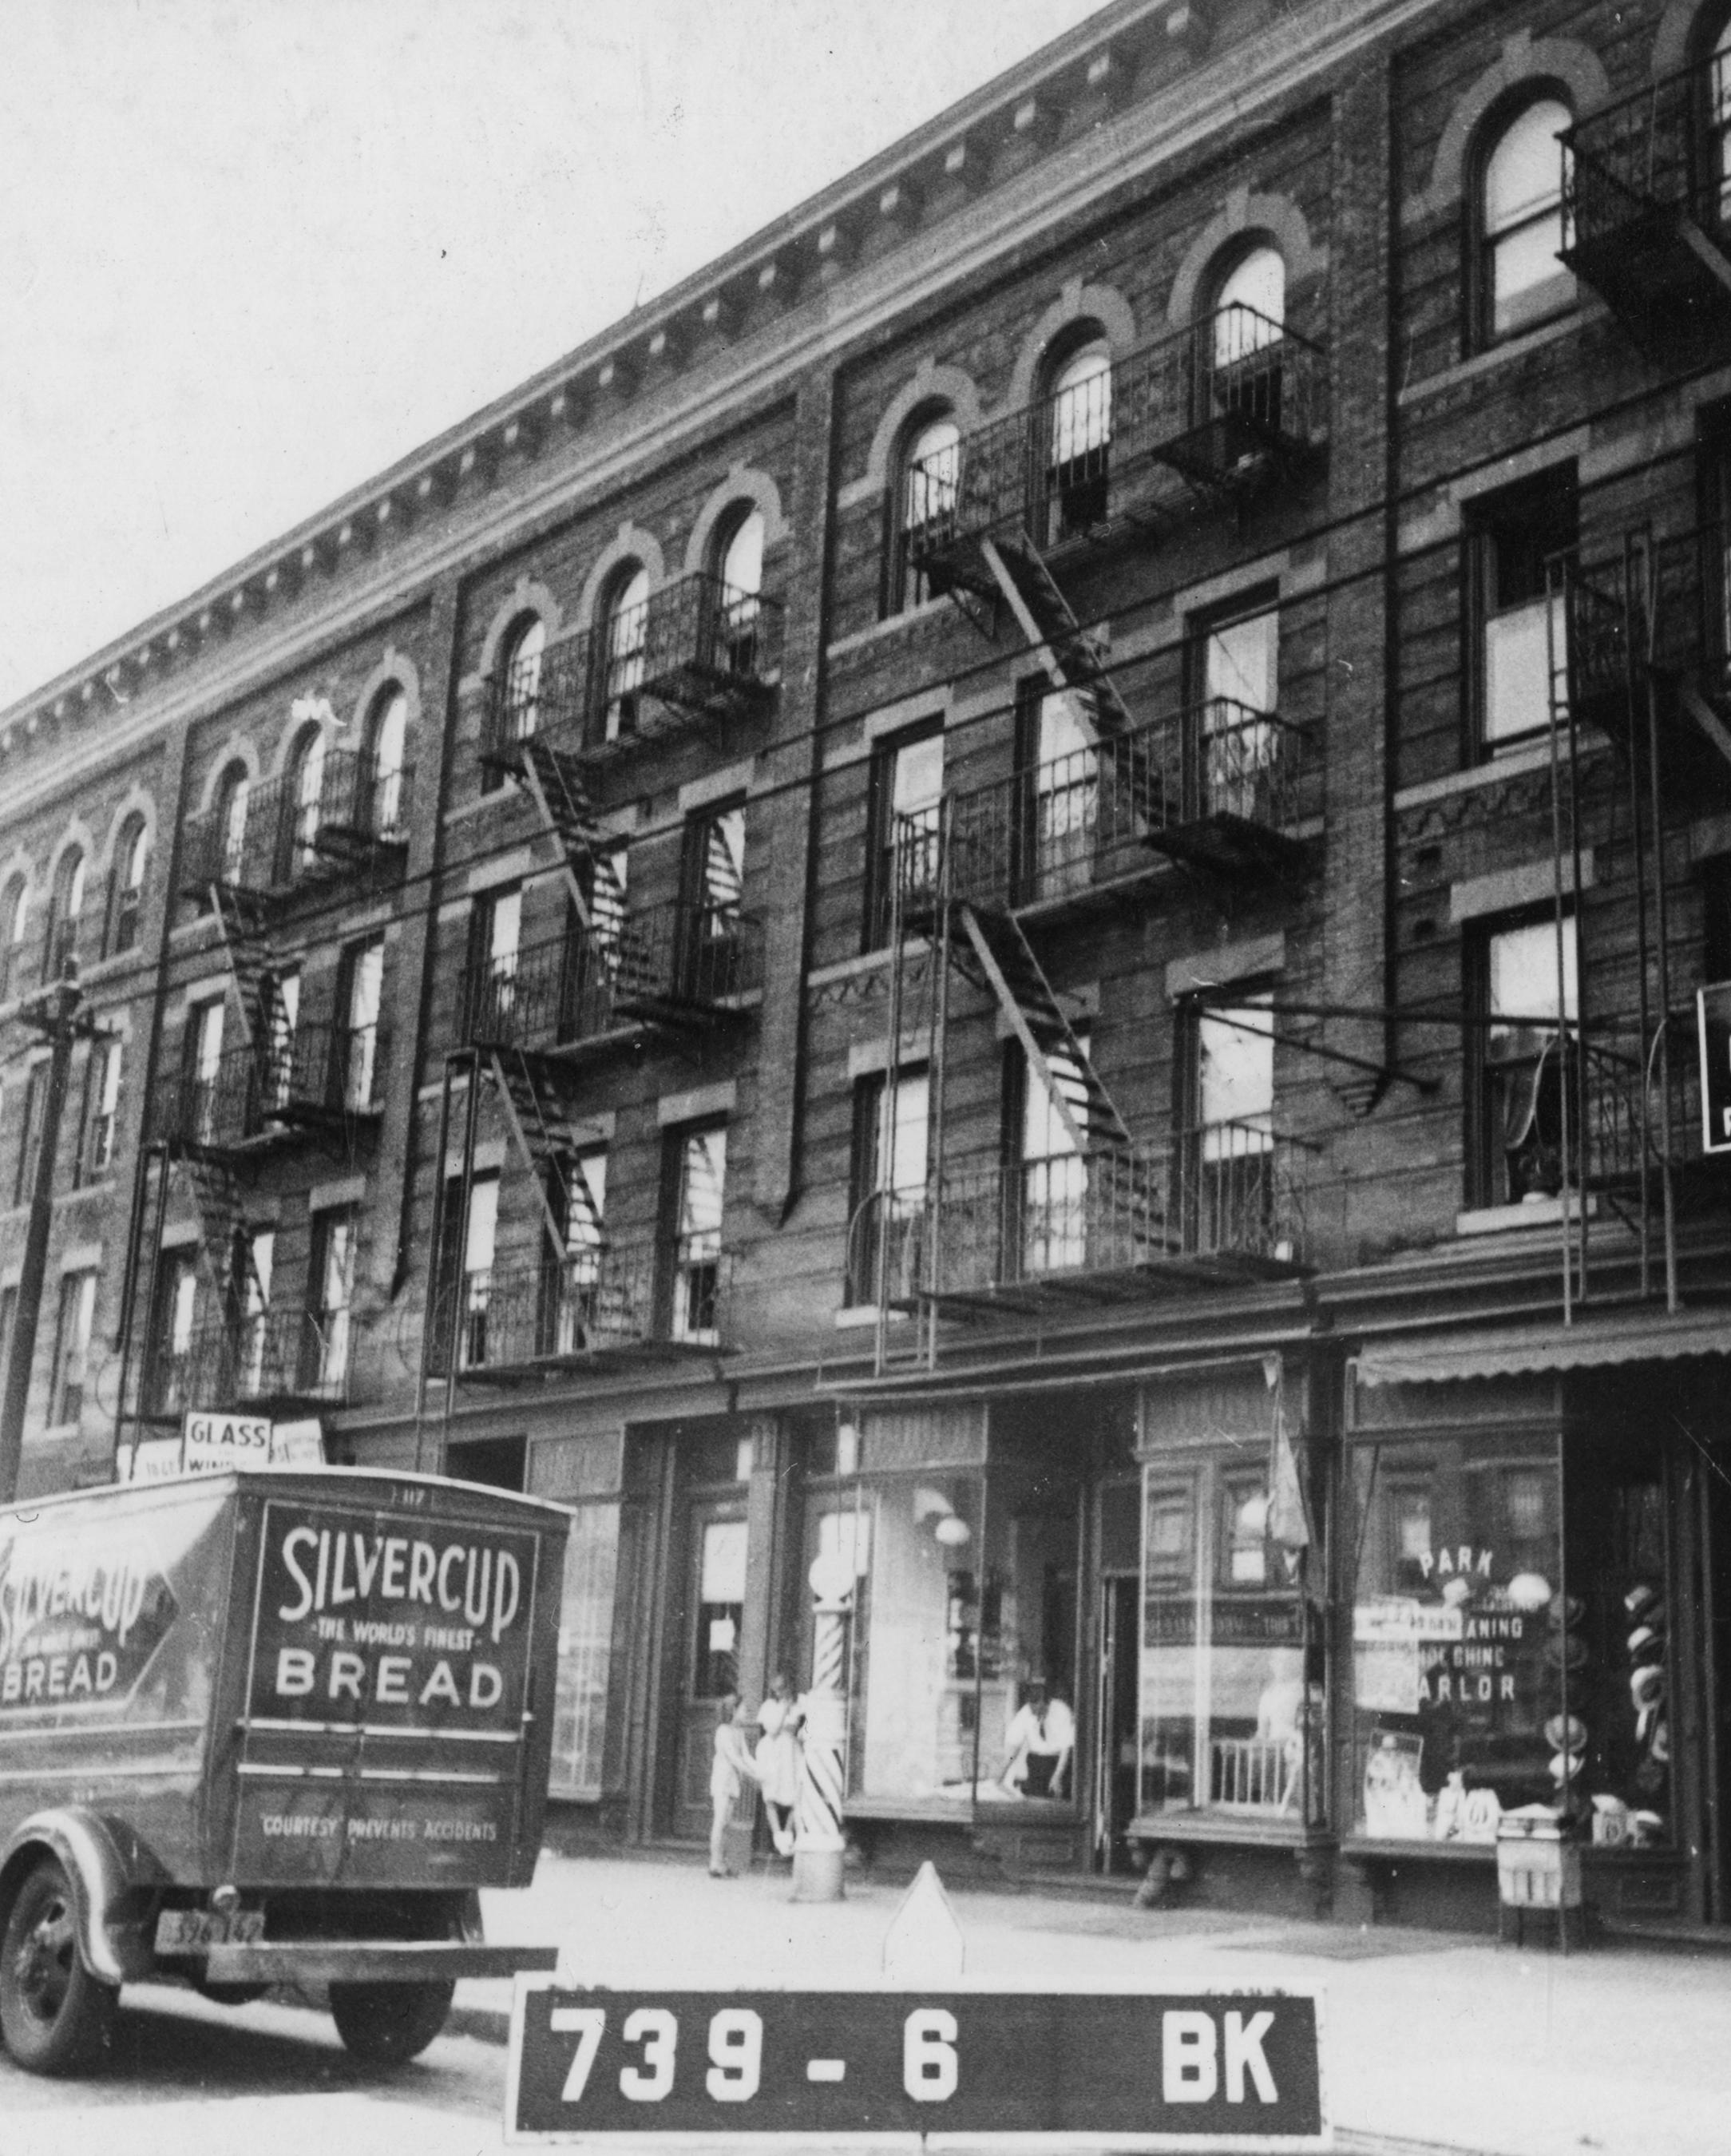 4409 5th Ave, Brooklyn, NY, circa 1940.NYC Municipal Archives.